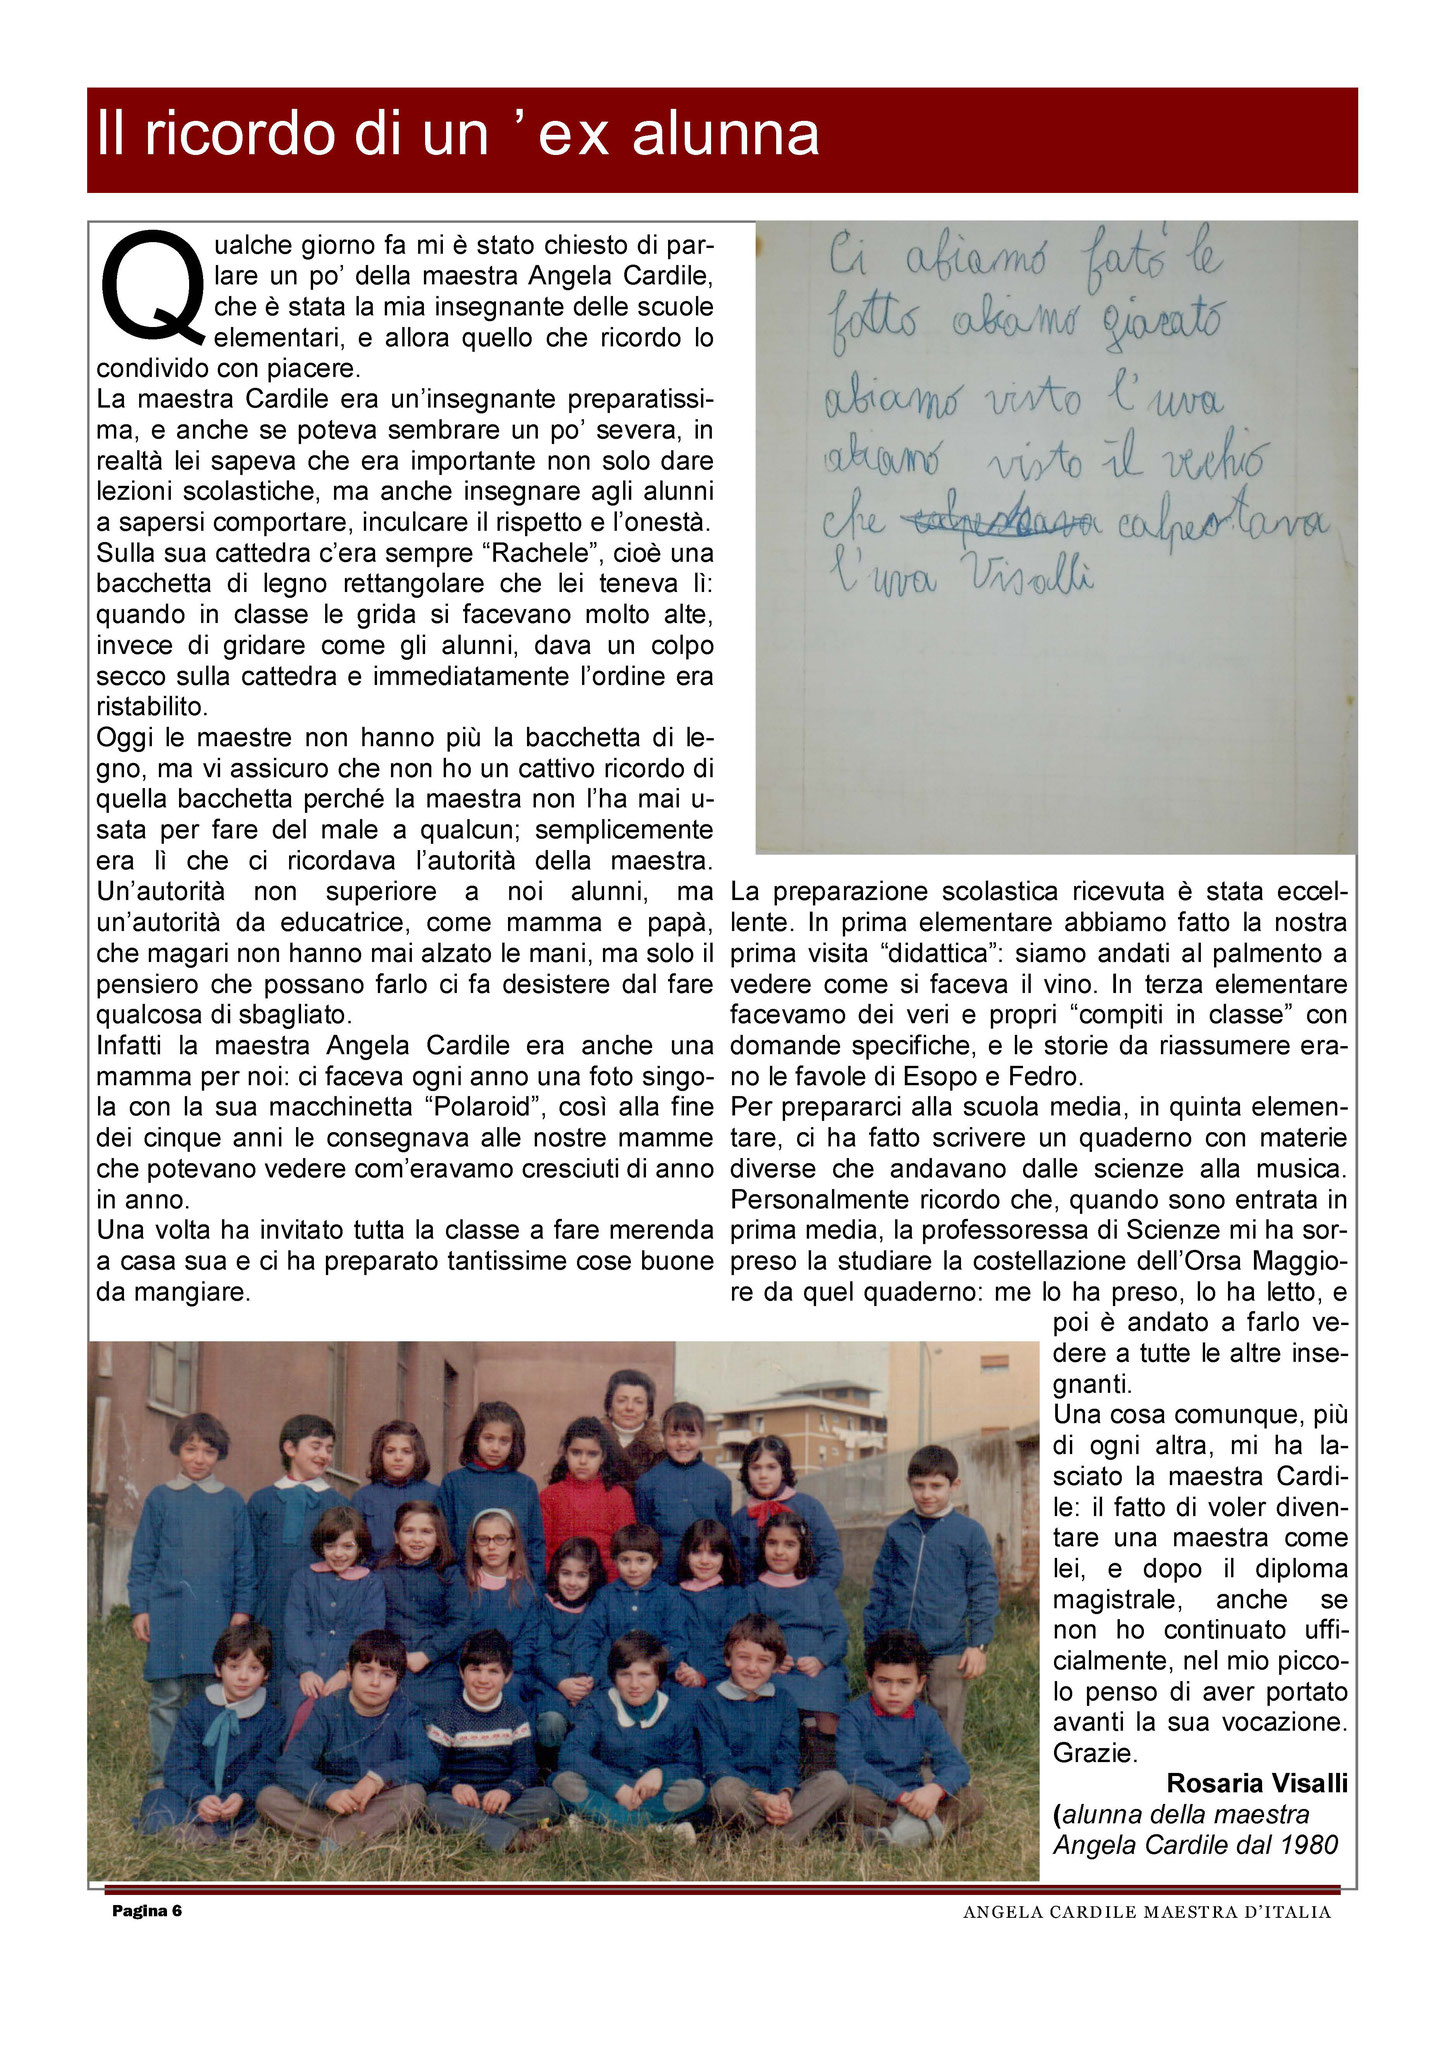 Pagina 6 di 8